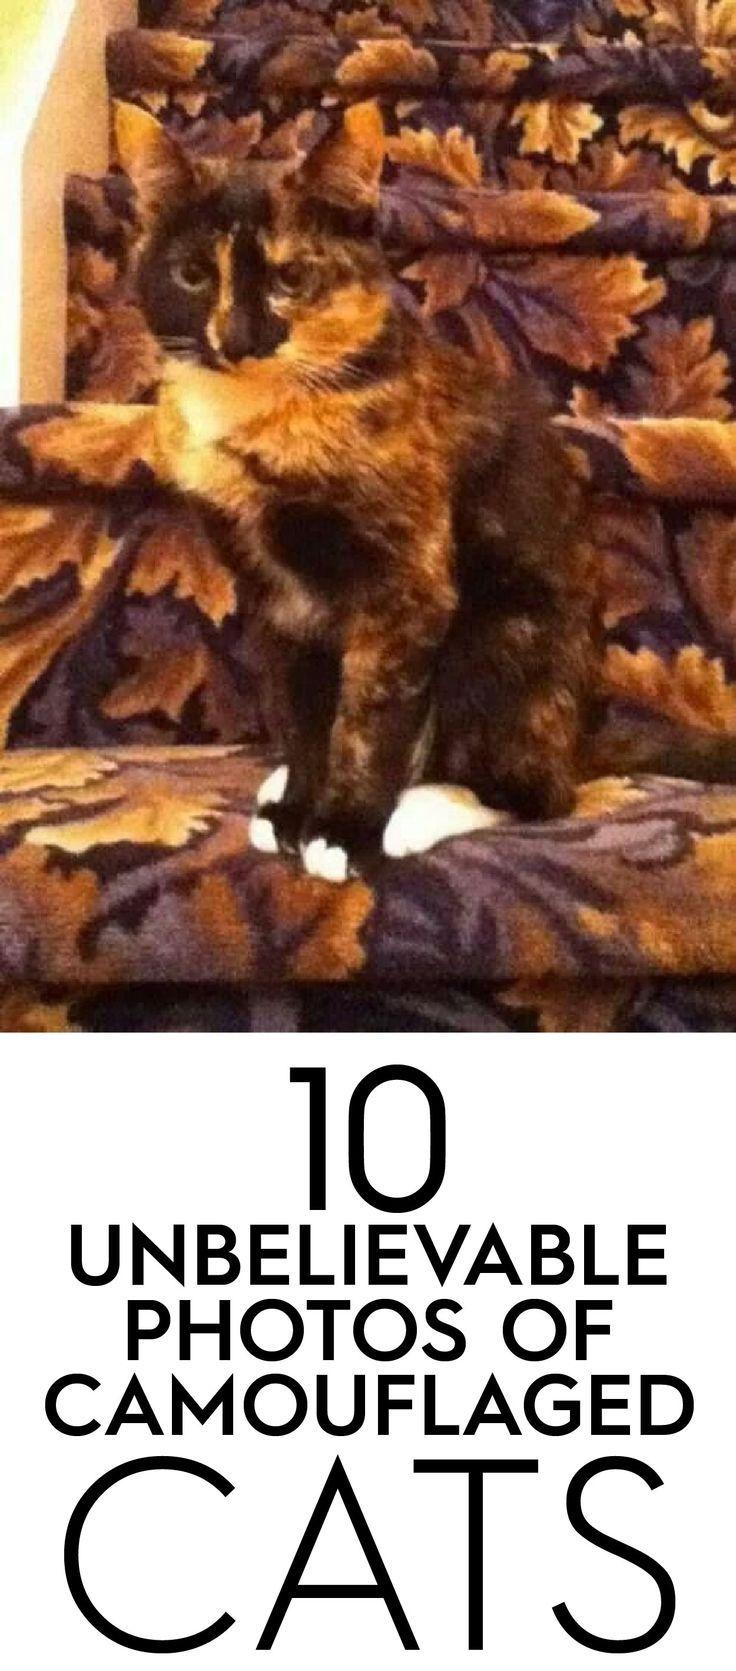 10 Amazing Photos of Camouflaged Cats